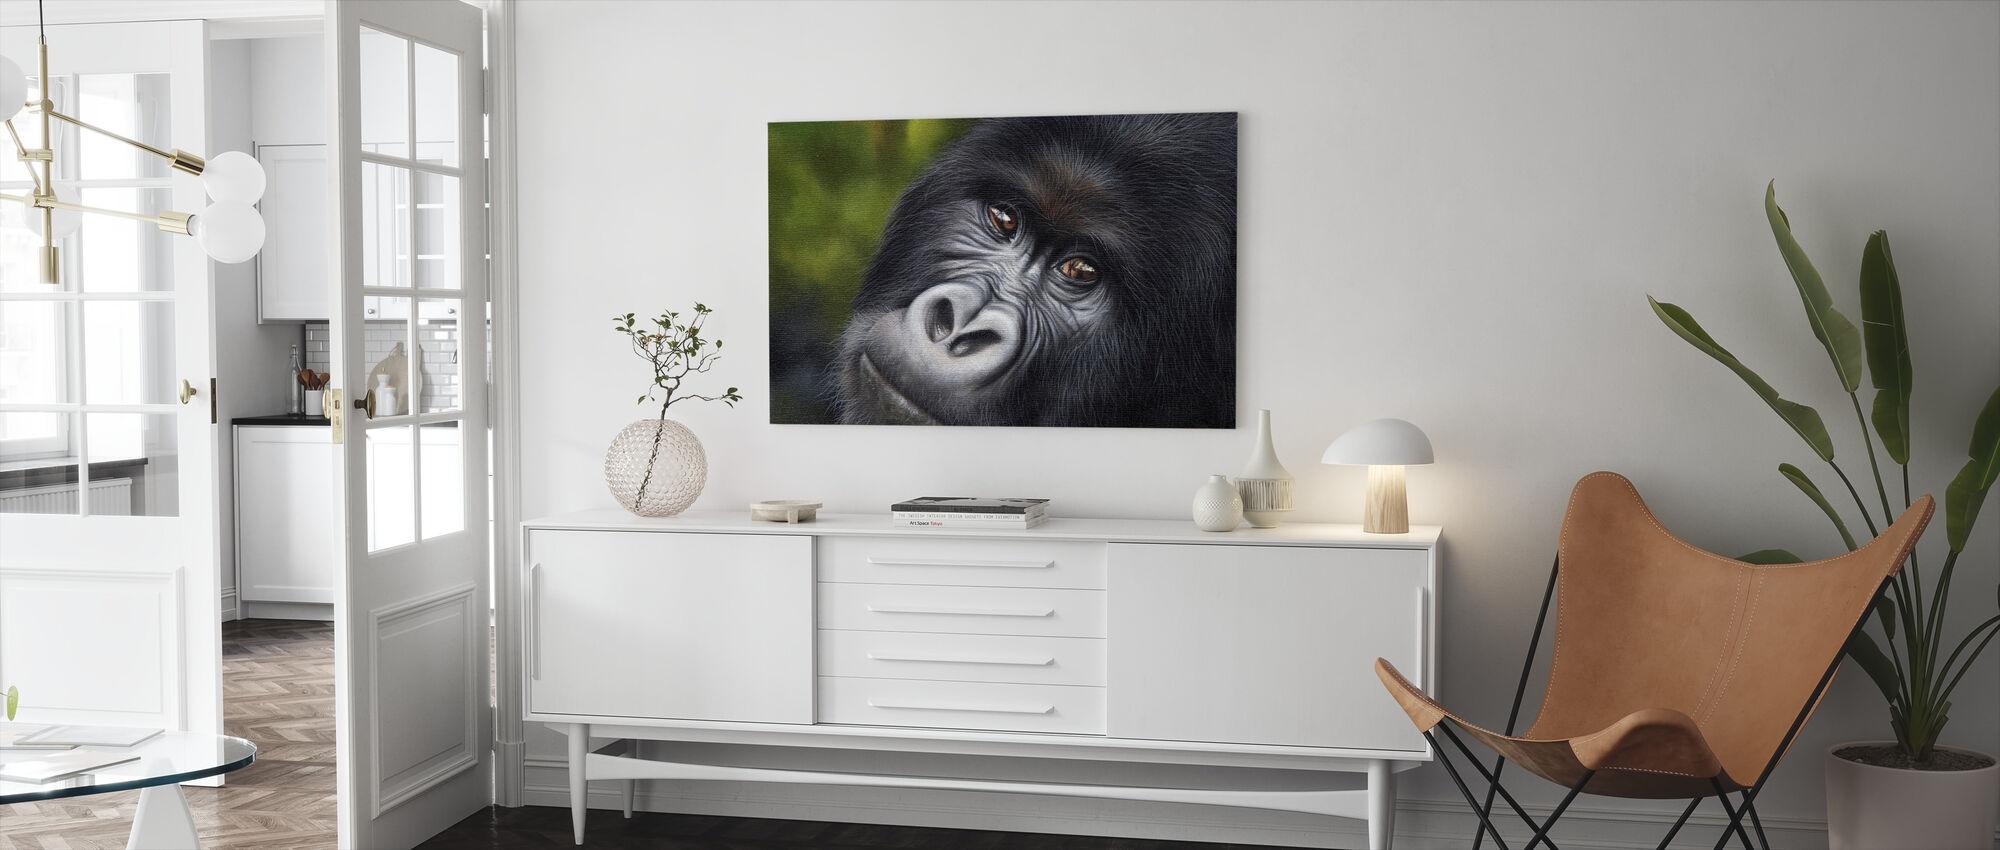 Berg Gorilla - Canvastavla - Vardagsrum